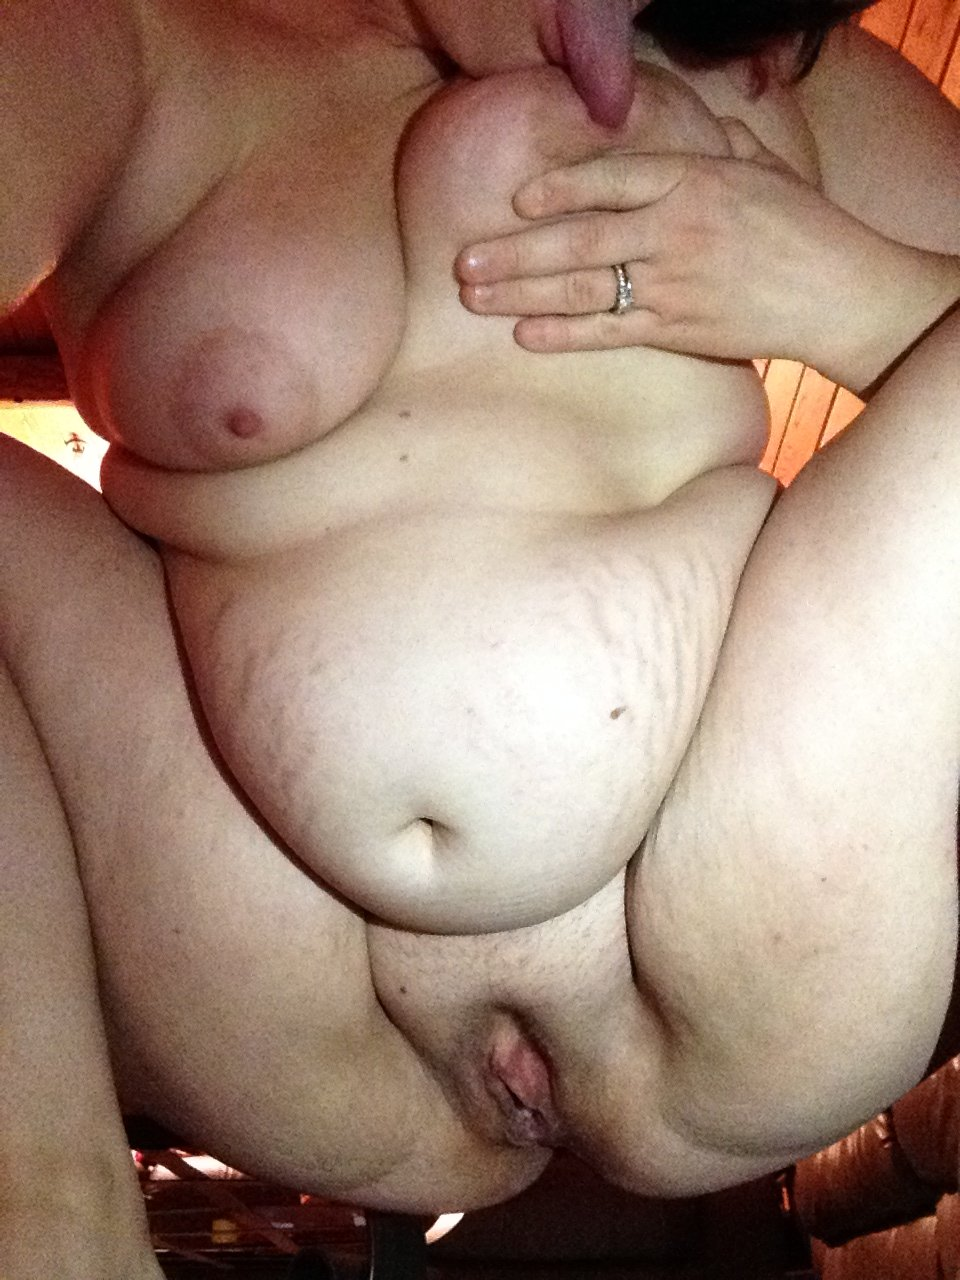 tolstushki-video-chastnoe-seks